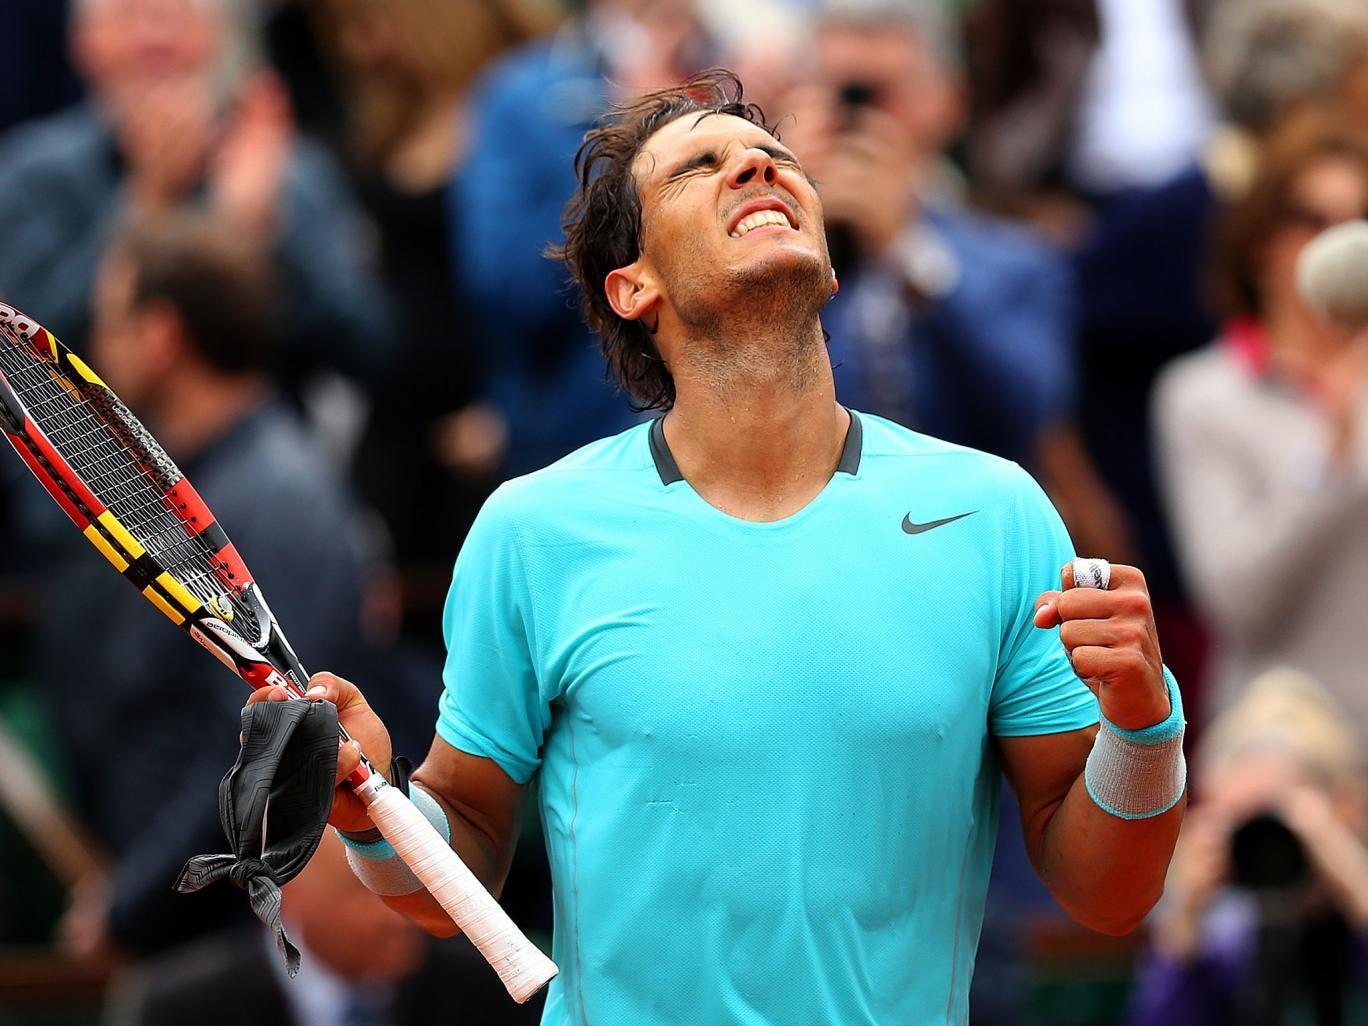 Rafael Nadal of Spain celebrates victory in his men's singles match against Dominic Thiem of Austria